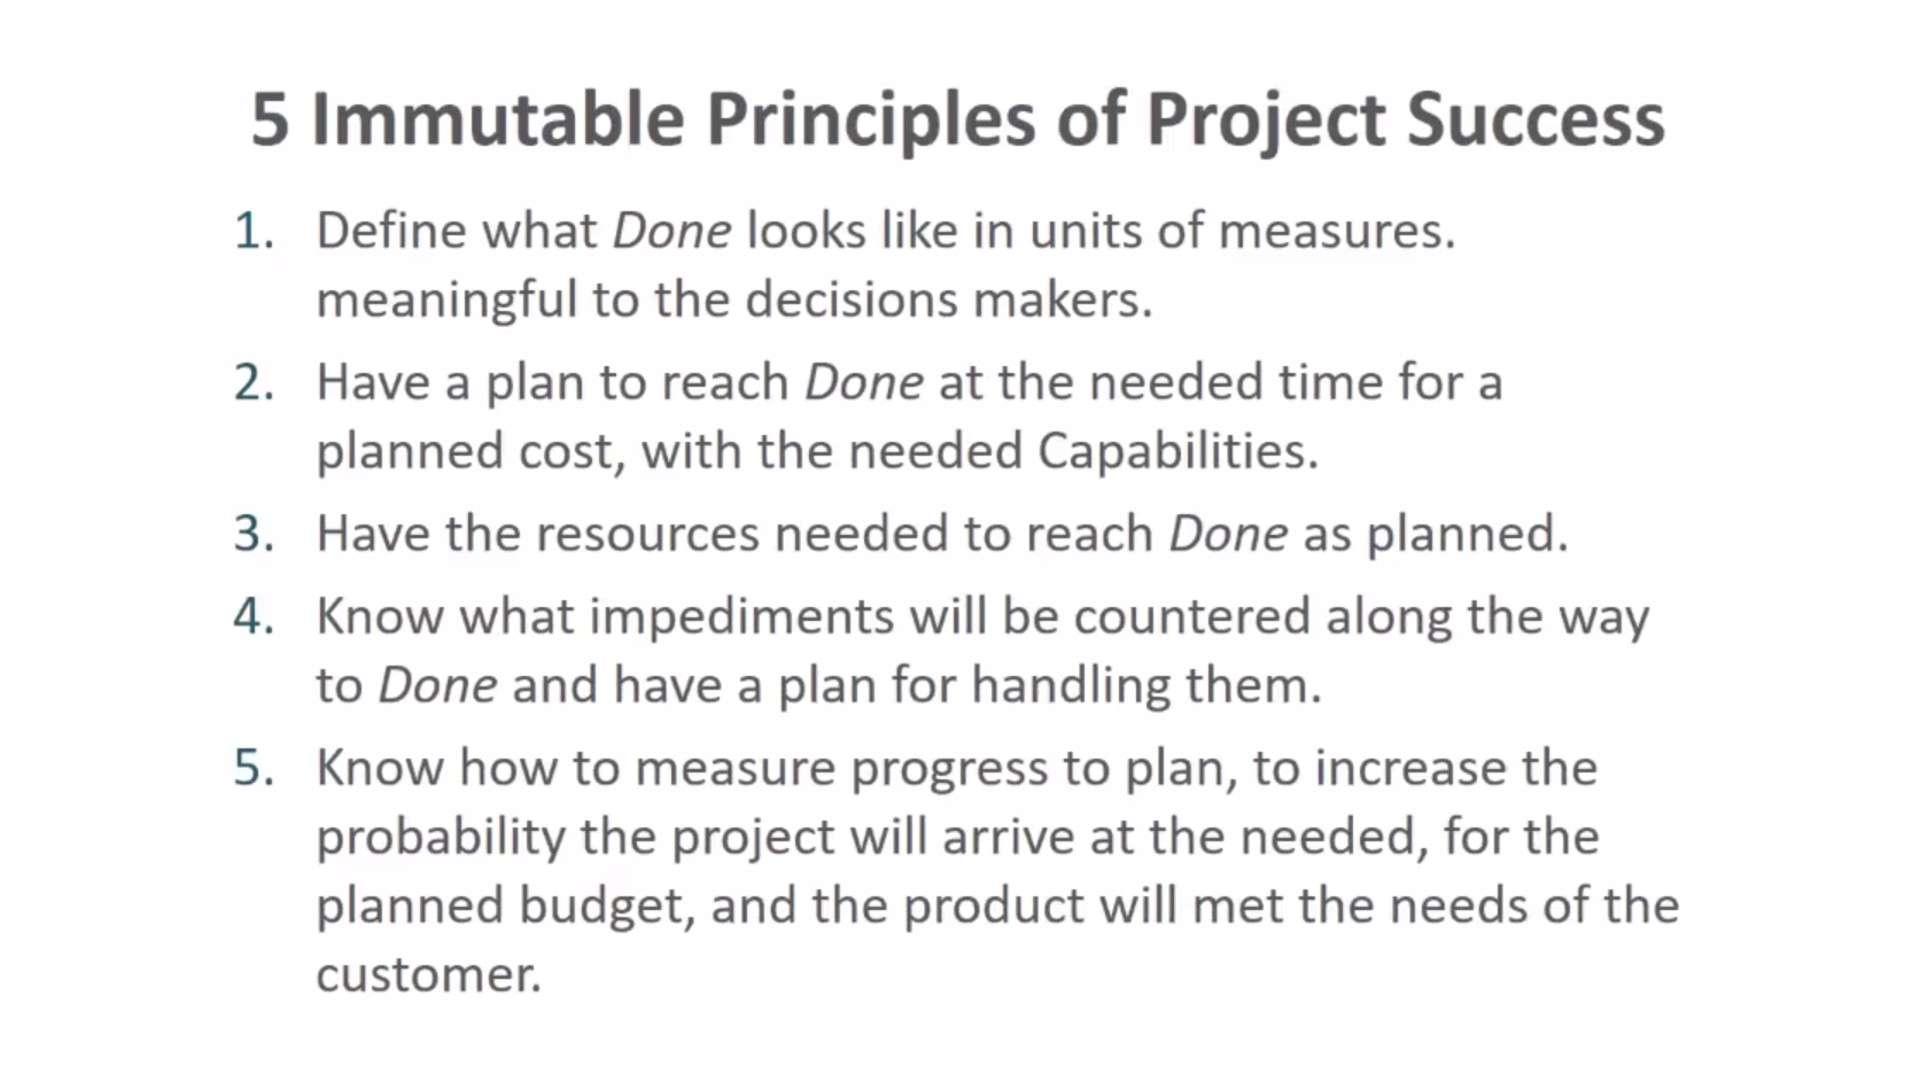 Five Immutable Principles of Project Success